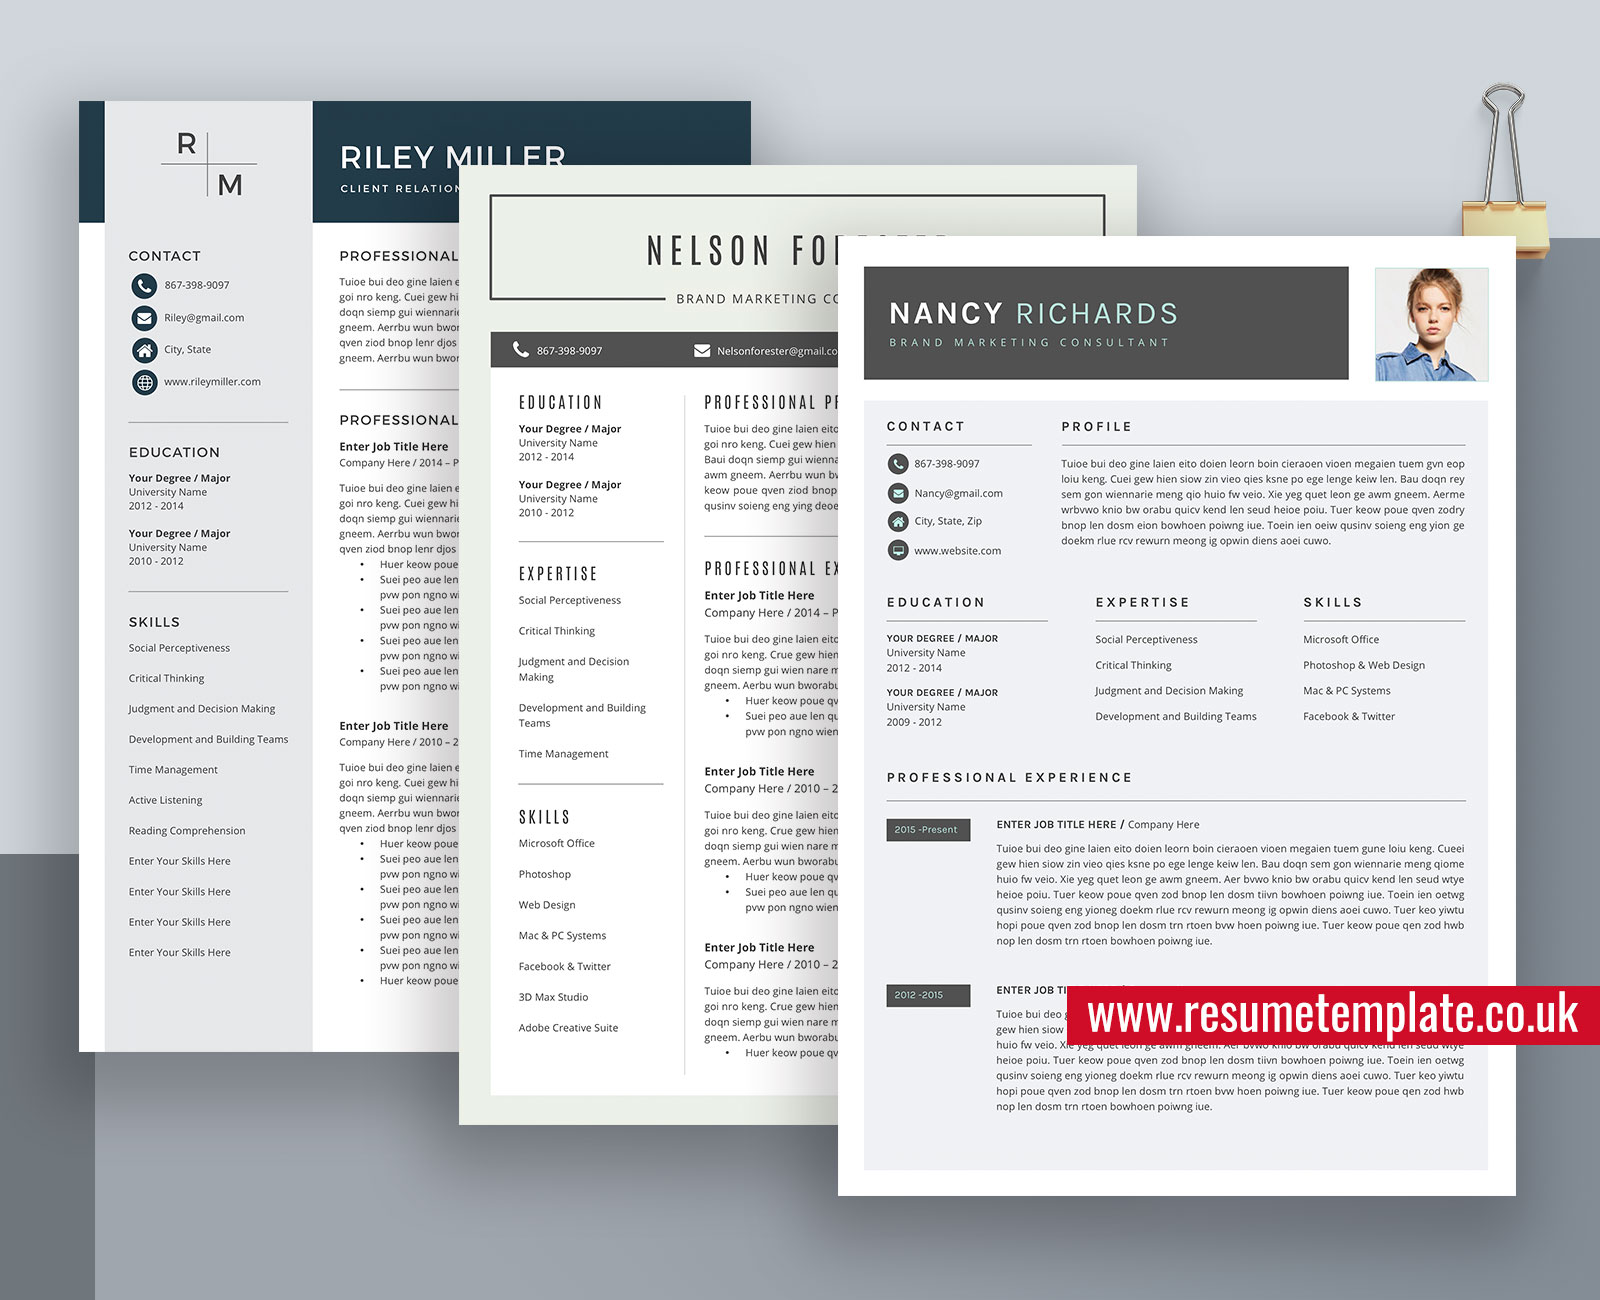 Modern Resume Cv Templates Curriculum Vitae Professional Resume Format Ms Word Resume 1 Page Resume 2 Page Resume 3 Page Resume Instant Download Resumetemplate Co Uk